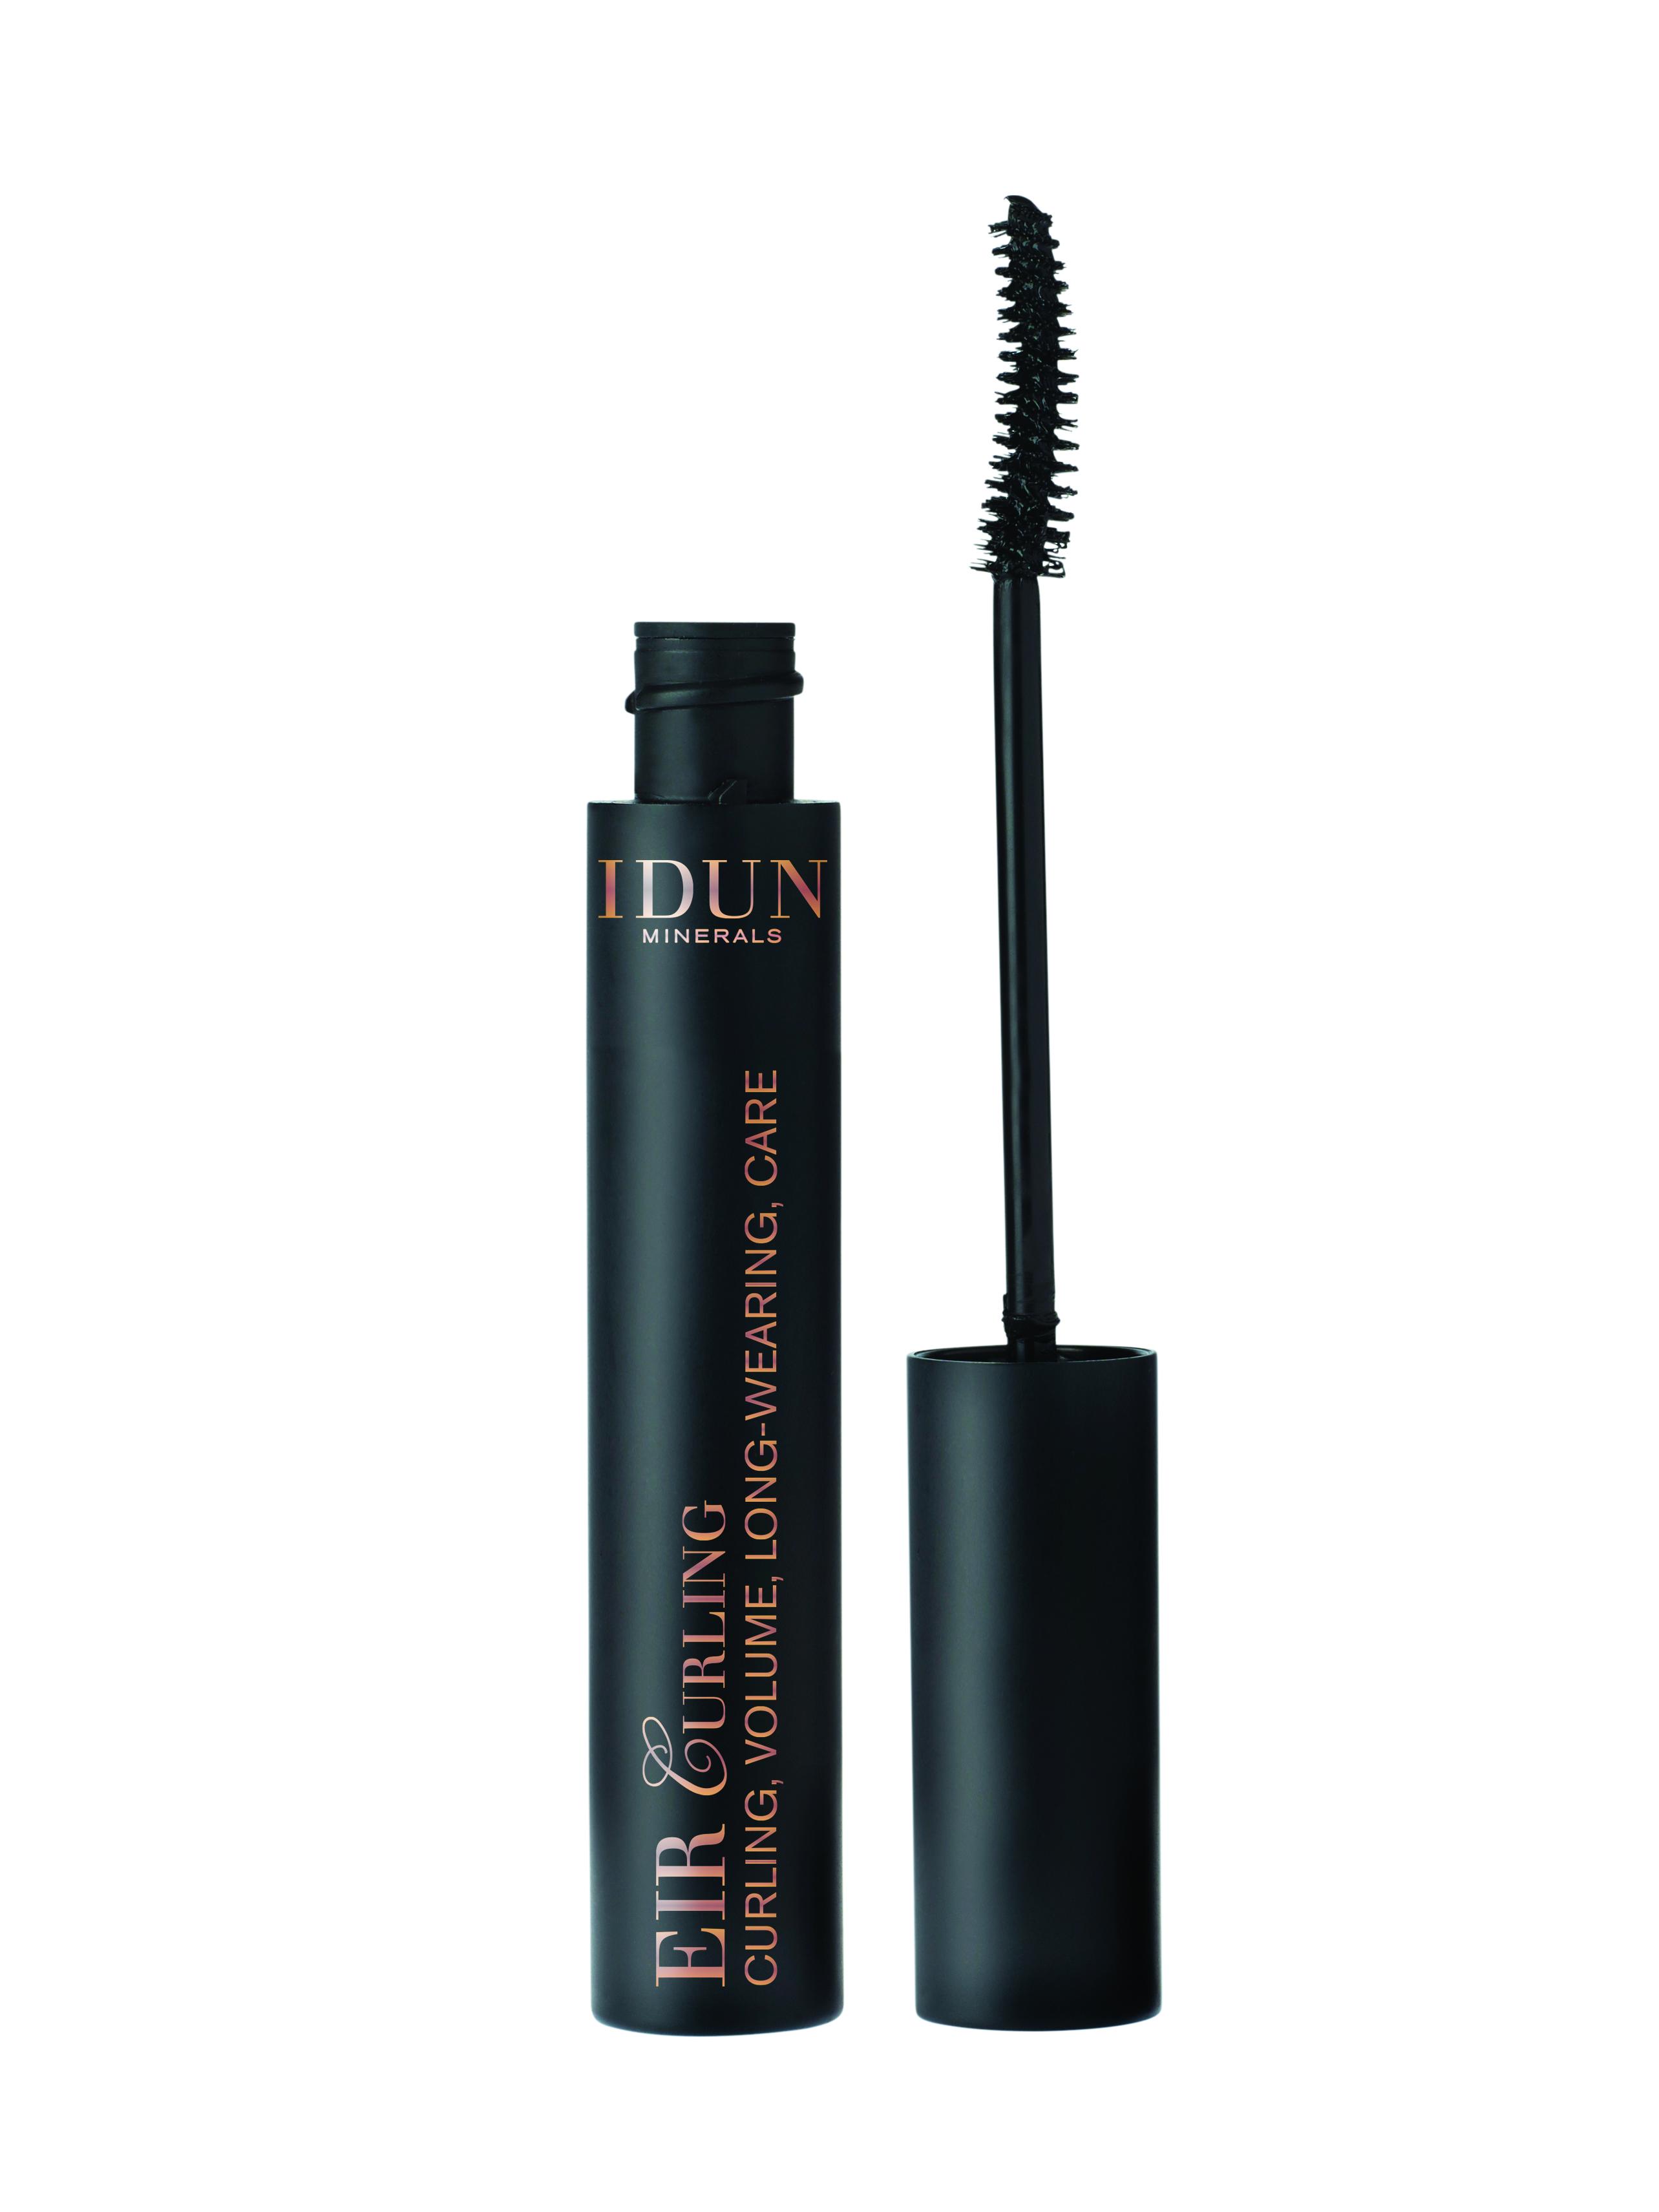 IDUN Minerals Eir Curling Mascara, black